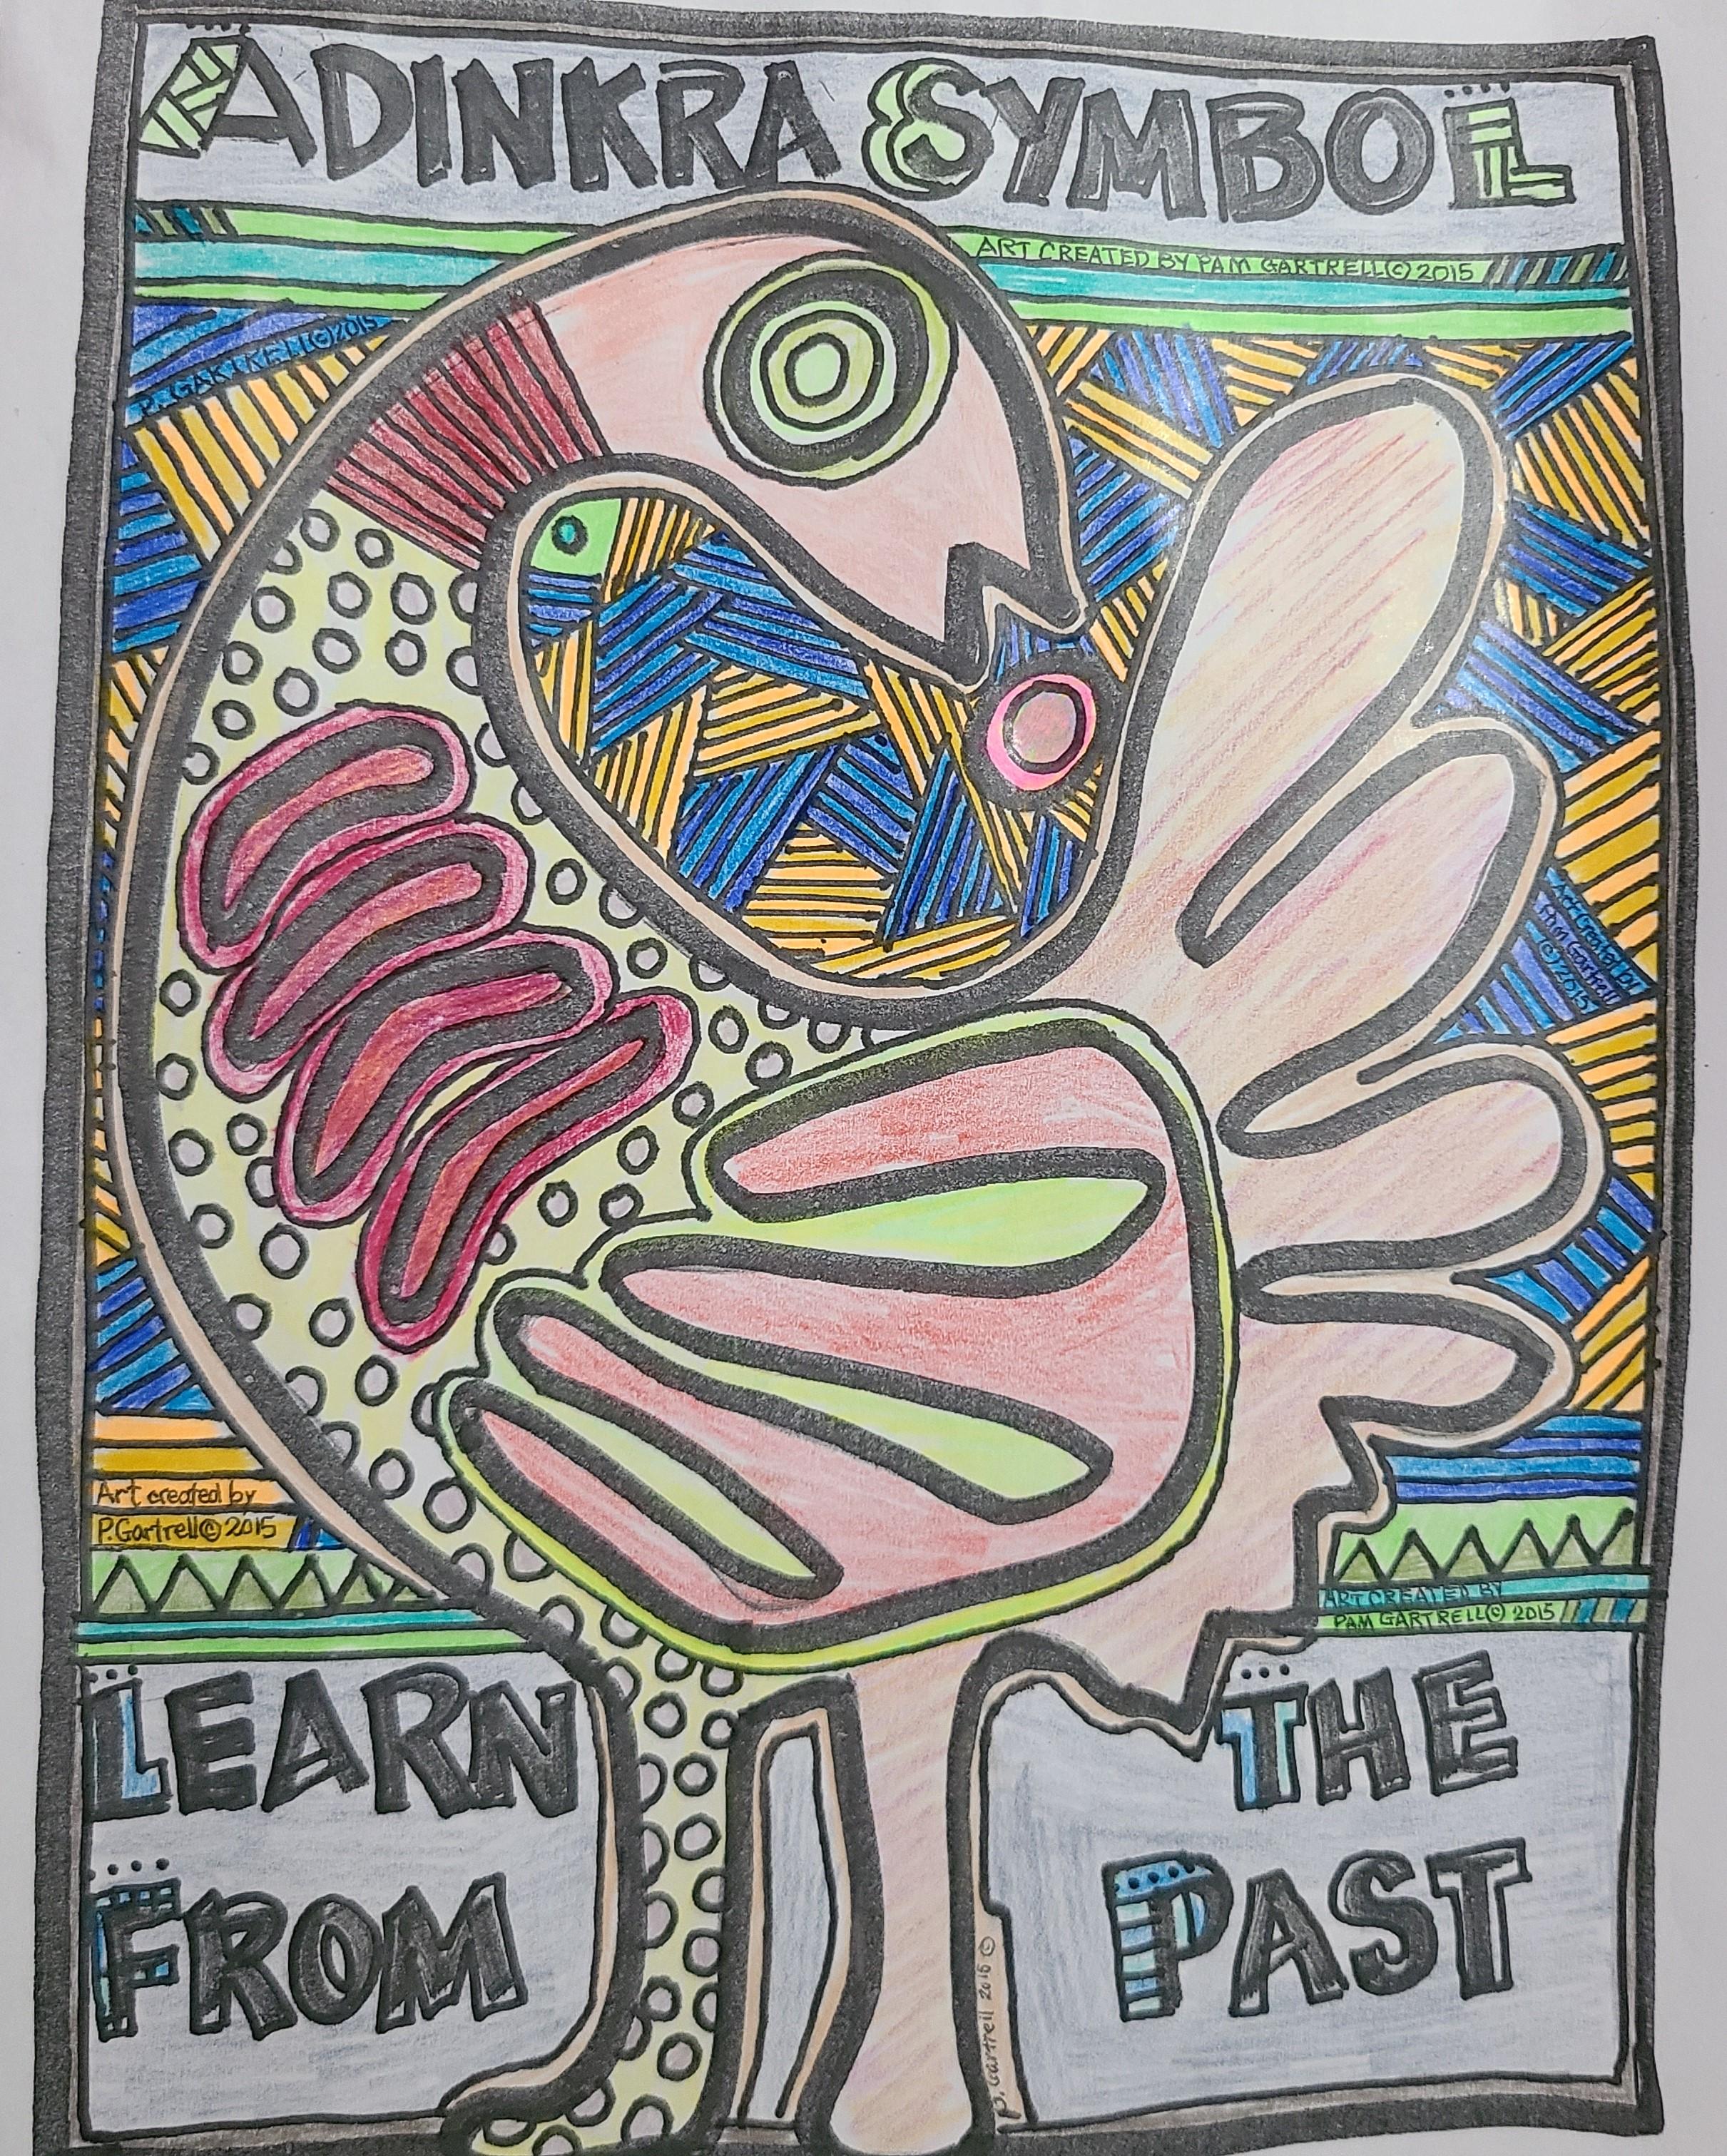 Learn from the past - Sankofa/Adinkra